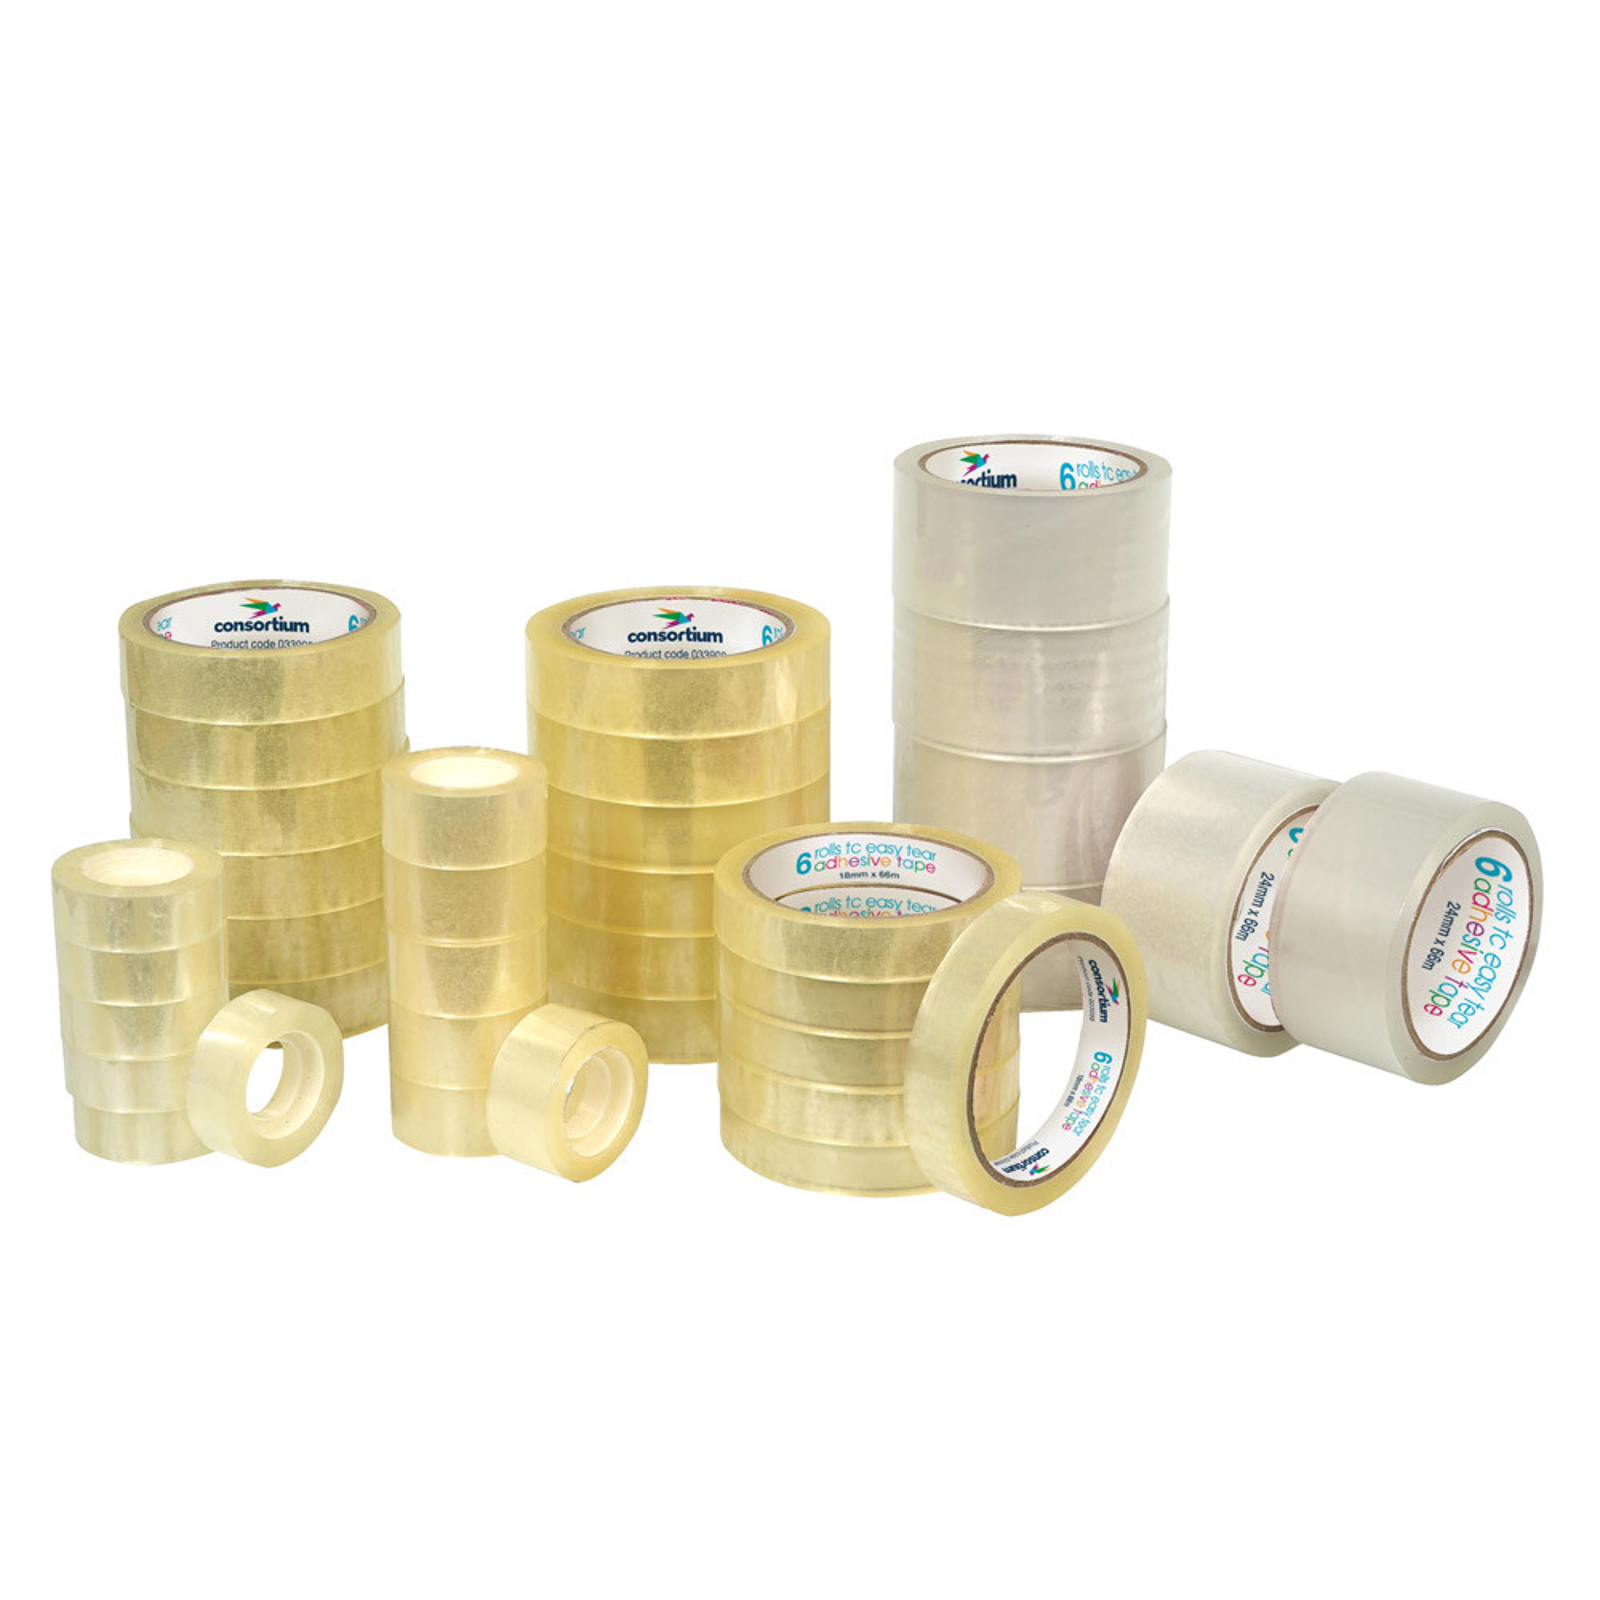 Consortium Adhesive Tape Tack And Tape Glue Sticks And